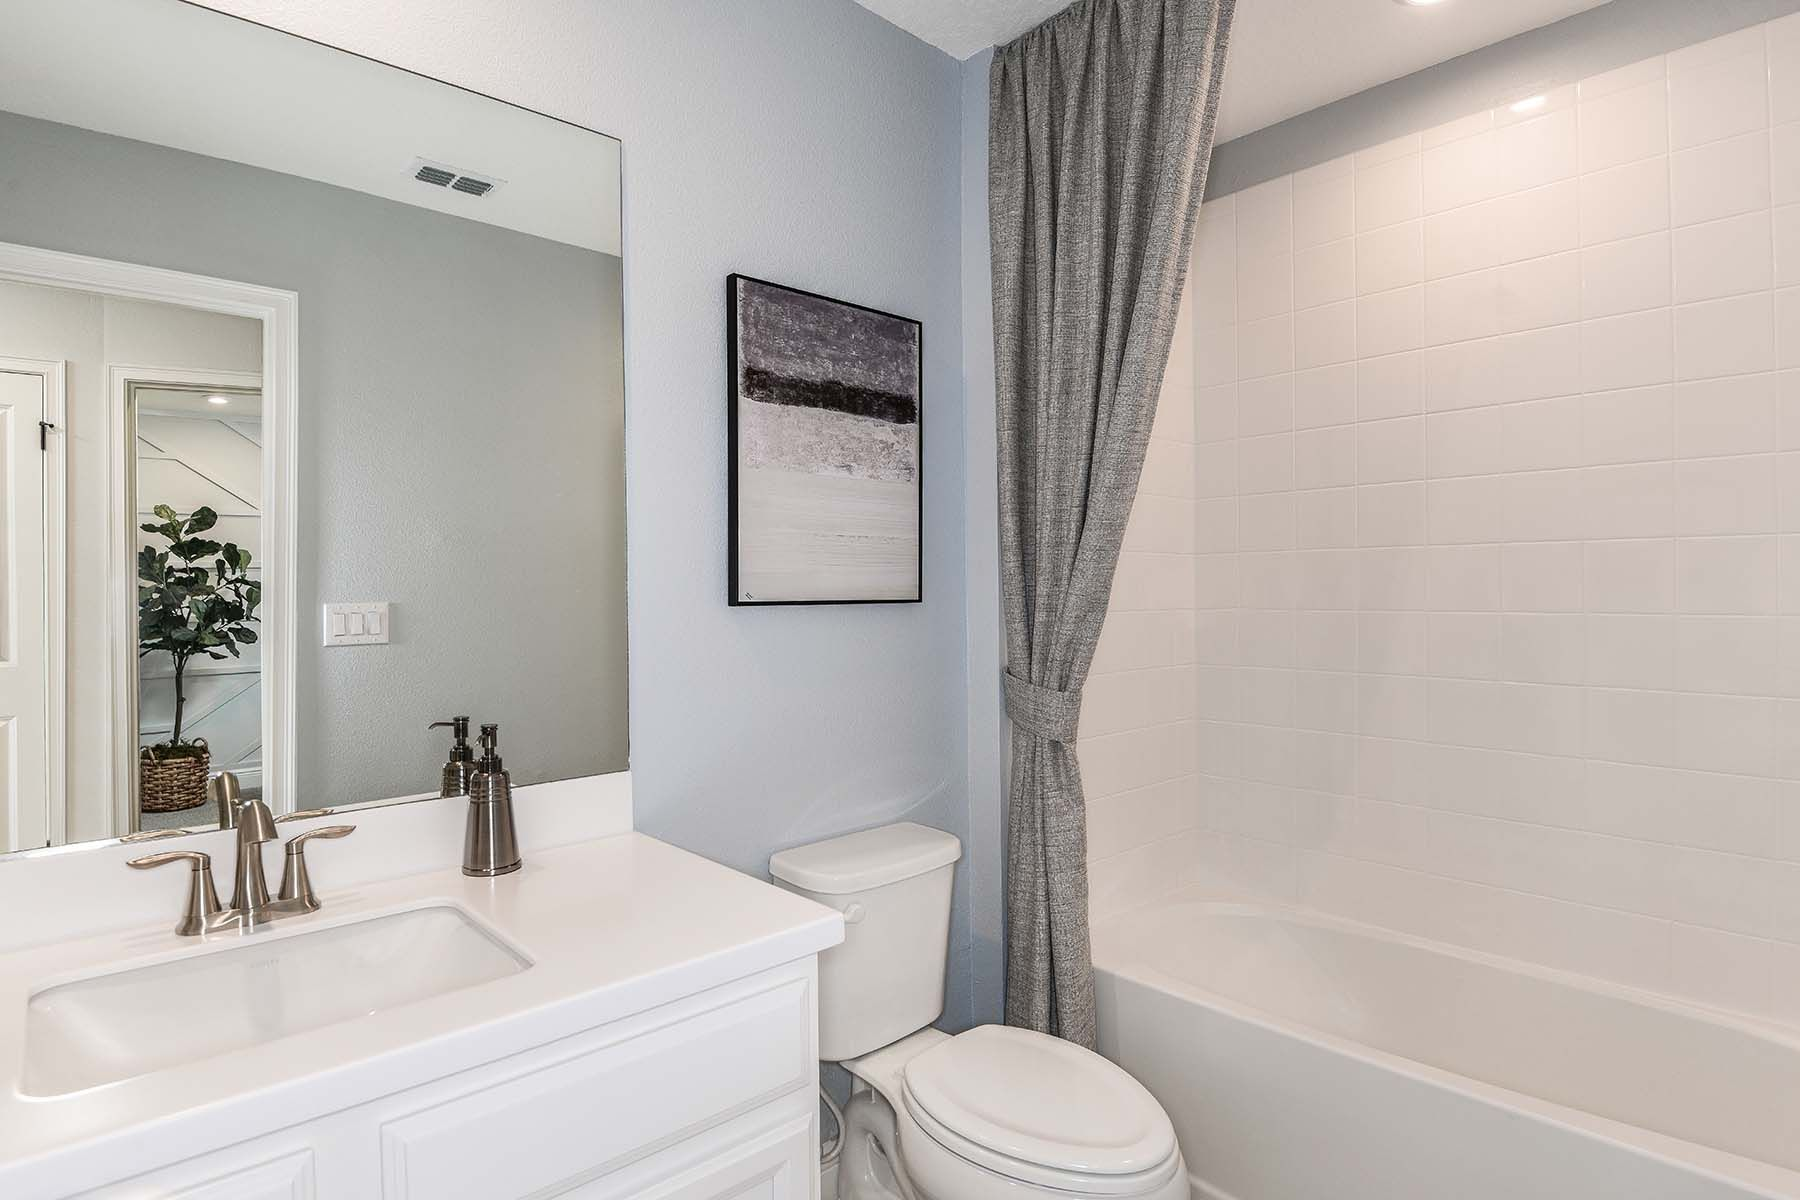 Bathroom featured in the Marina II By Mattamy Homes in Sarasota-Bradenton, FL